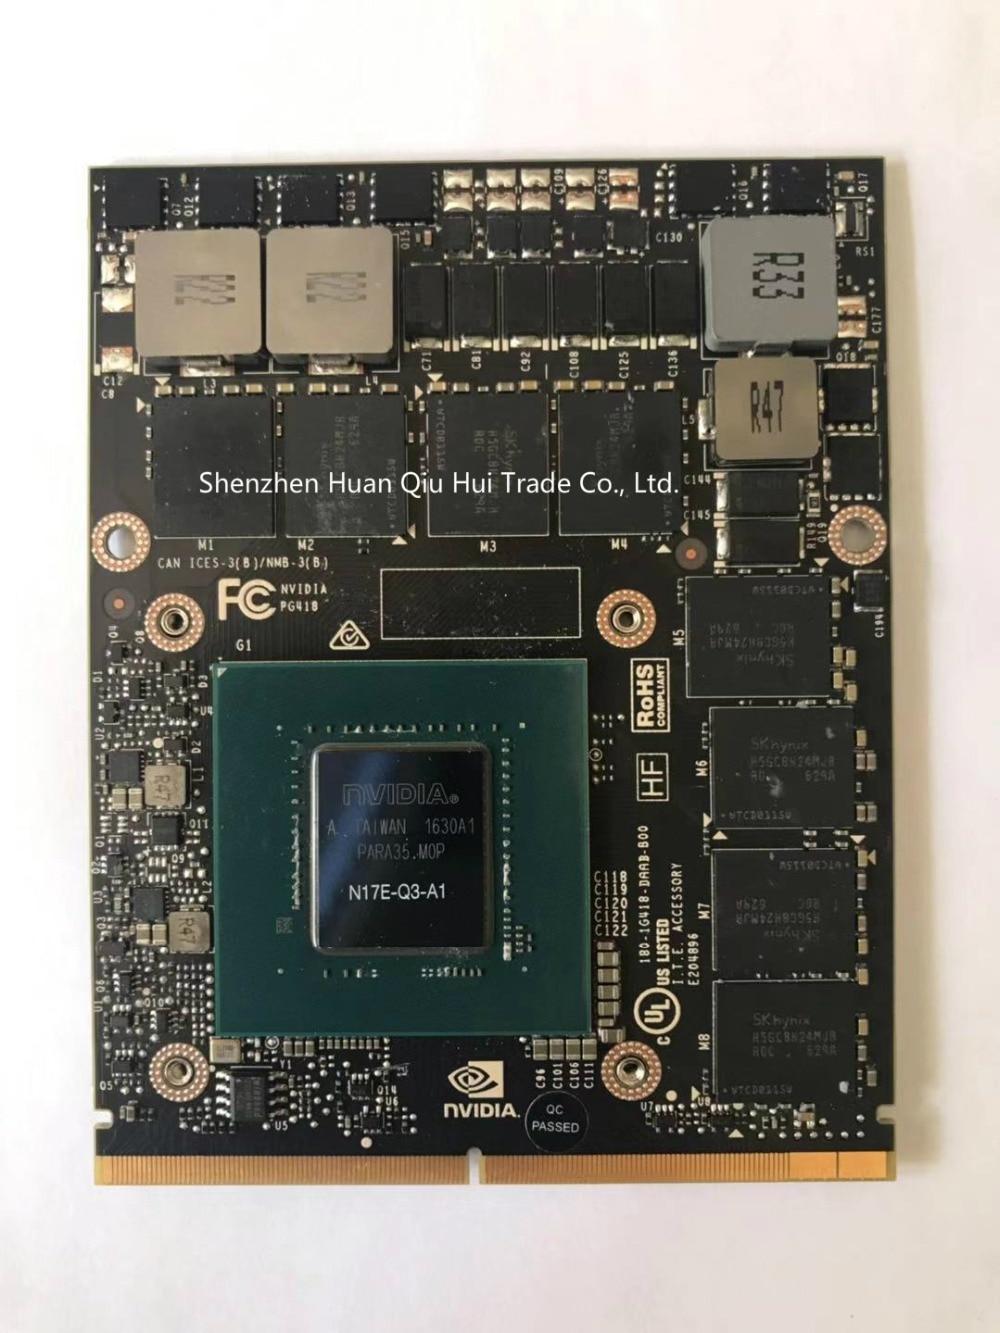 Origianl For DELL NVIDIA Quadro P4000 MXM GPU Card N17E-Q3 For M7710 M7720 Zbook17 G3 G4 Video Graphics Card